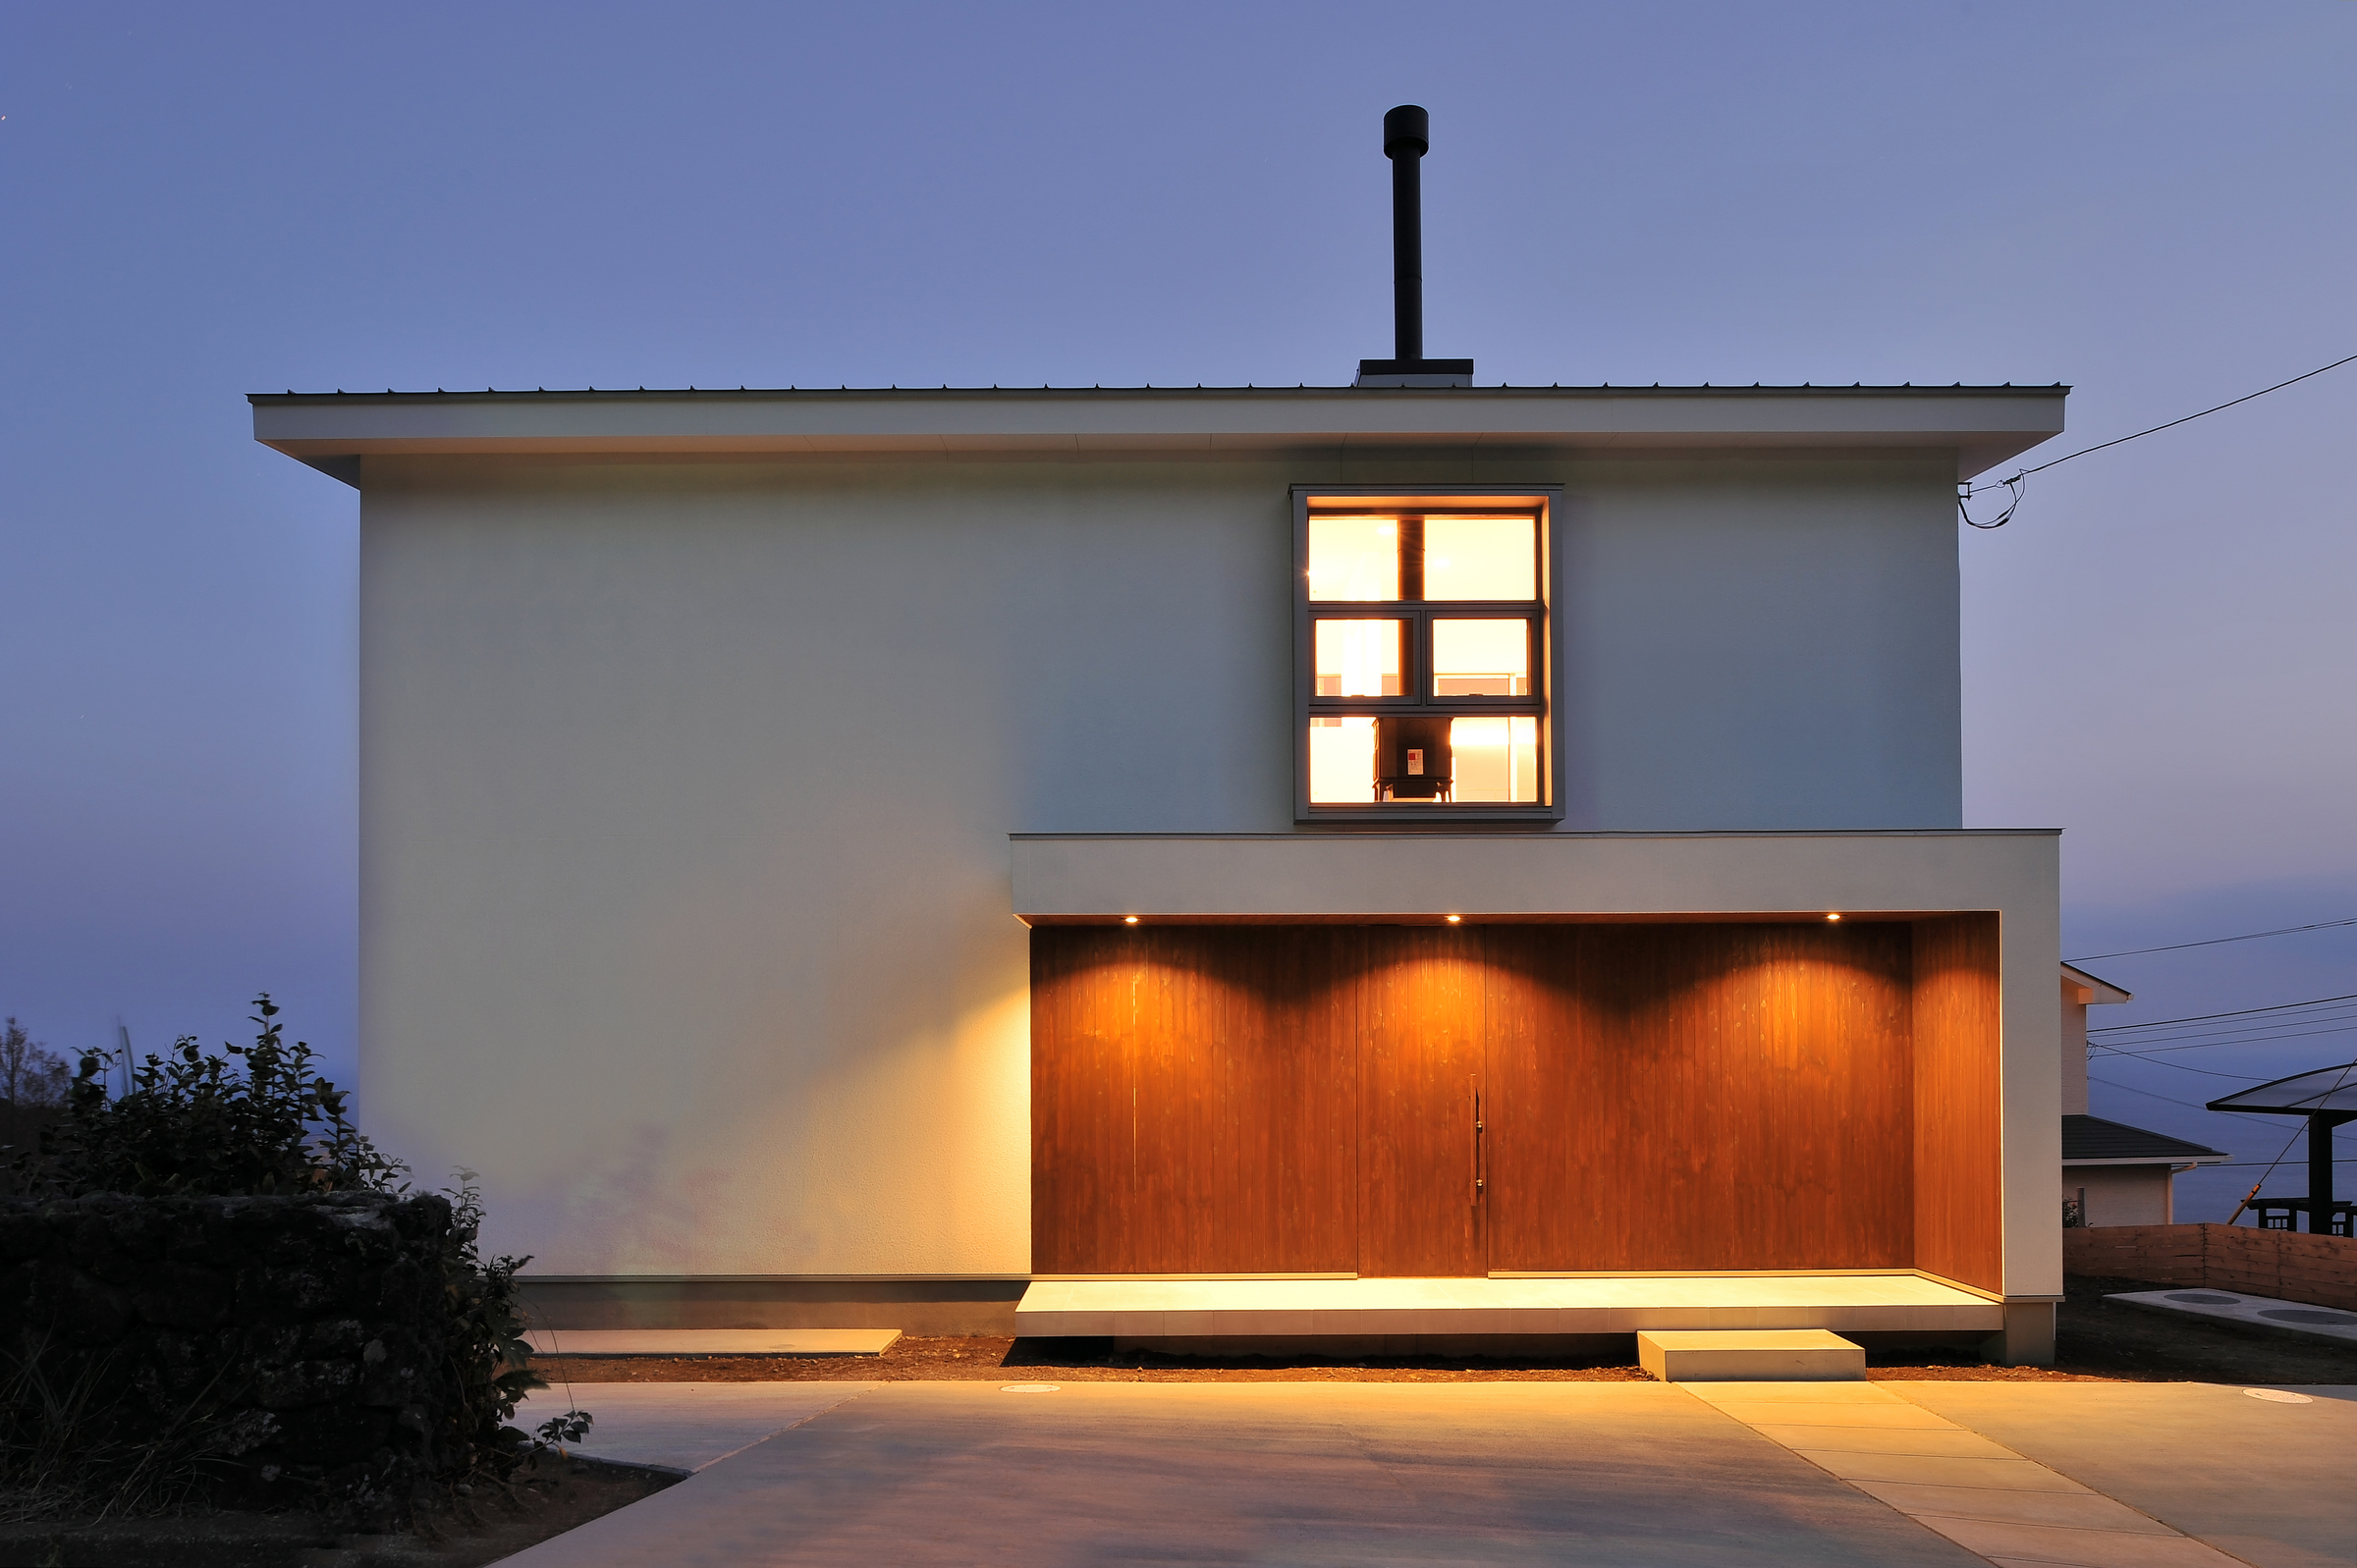 icaaの設計事例「伊東赤沢の家」(静岡県伊東市)